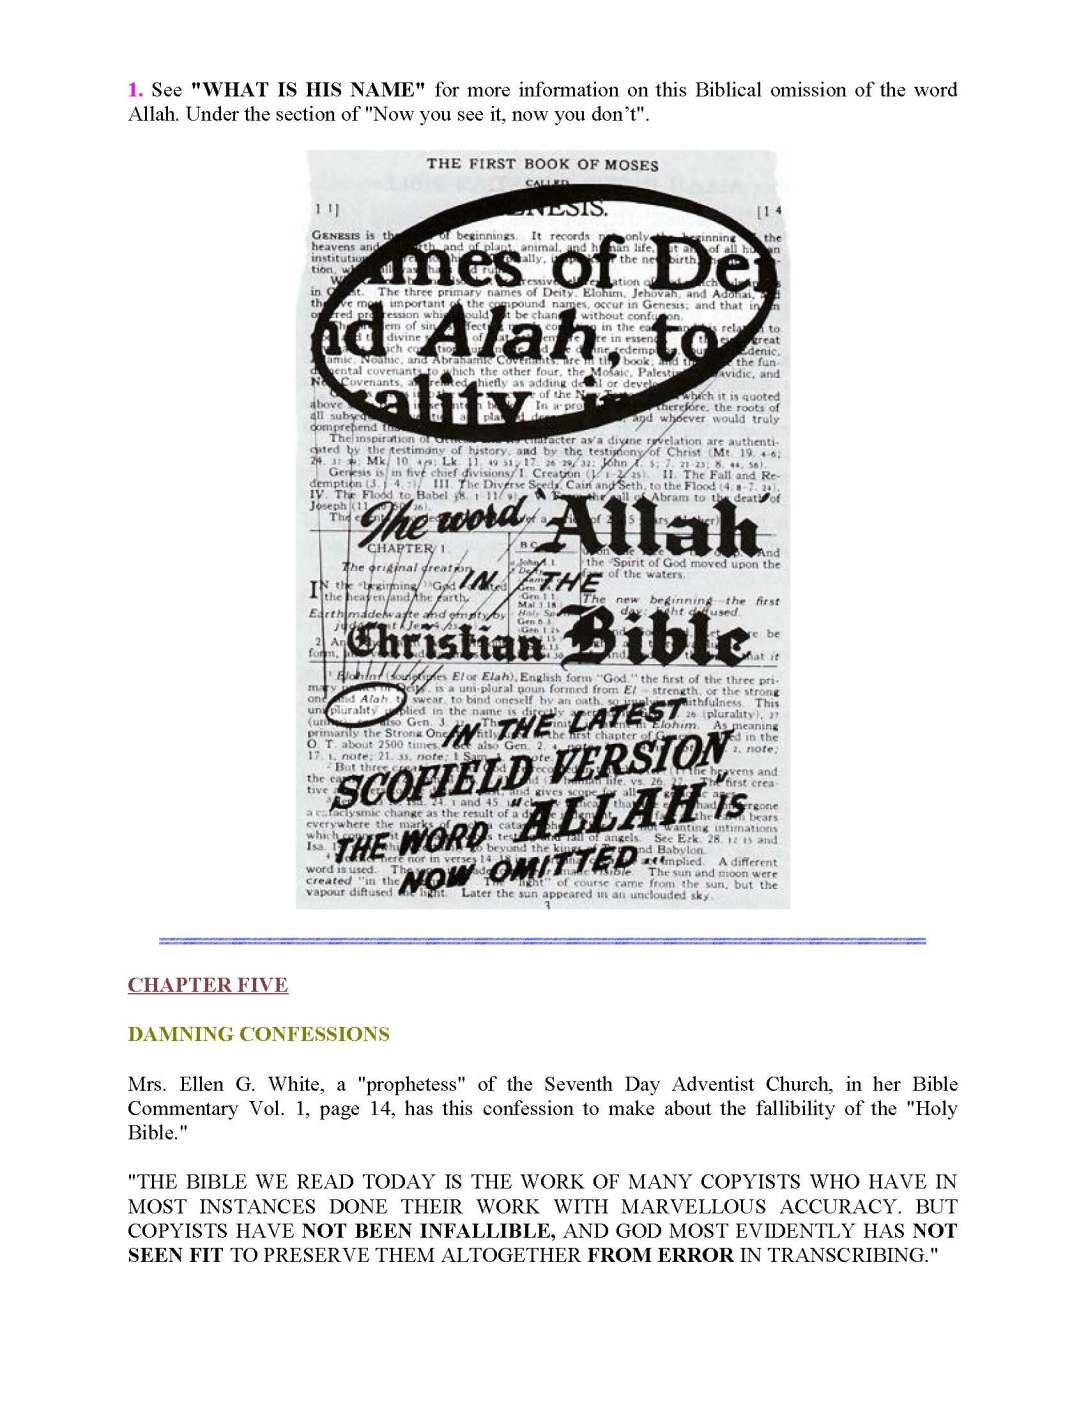 Is The Bible Gods Word [deedat]_Page_17